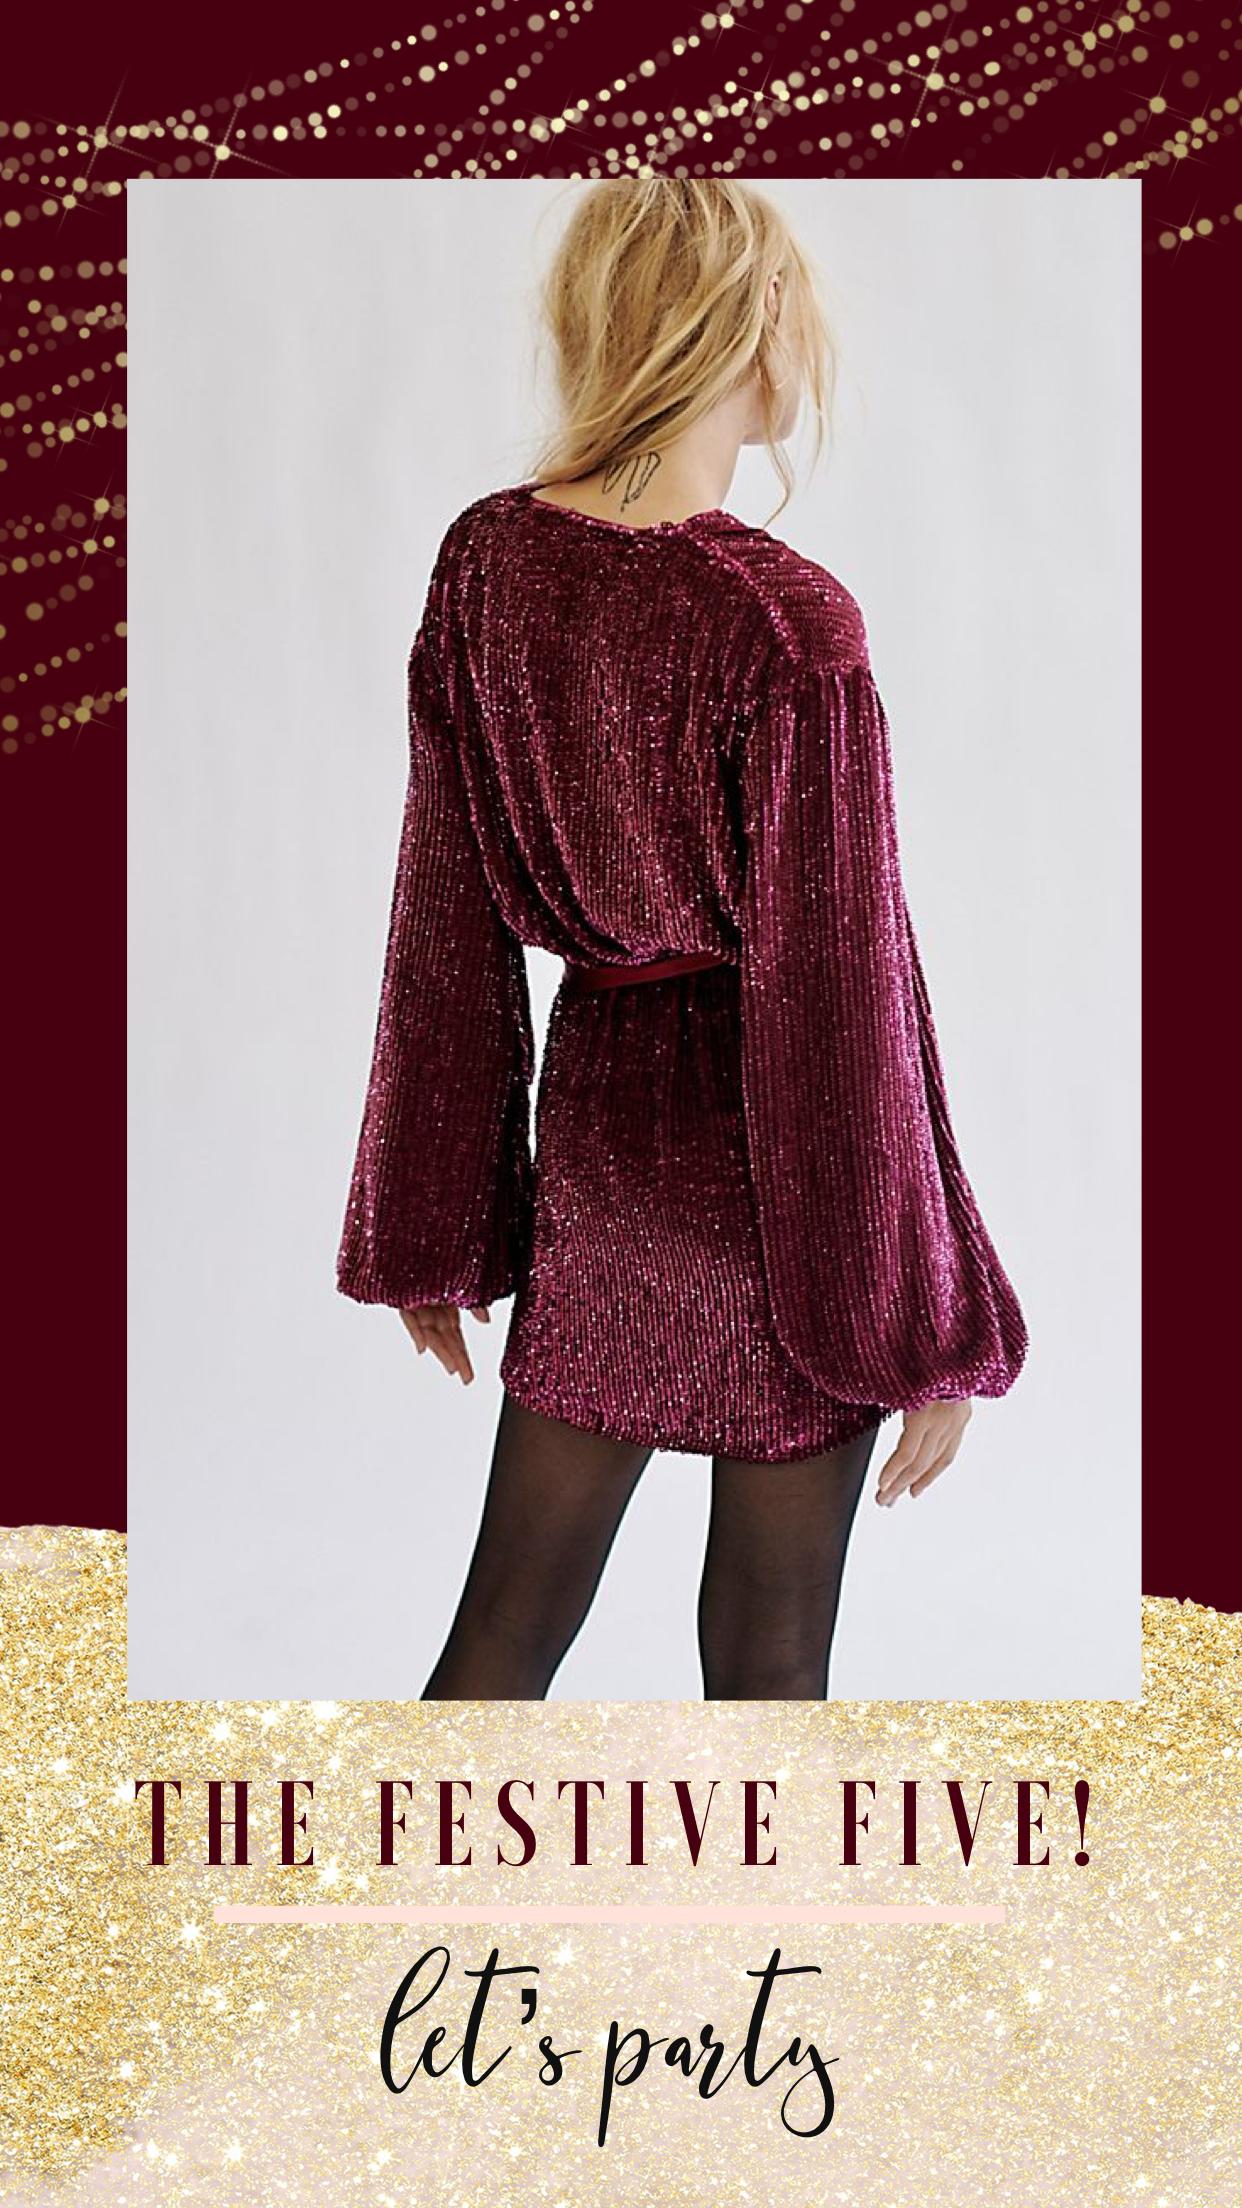 sequin dress, party dress, retro party dress, Christmas dress